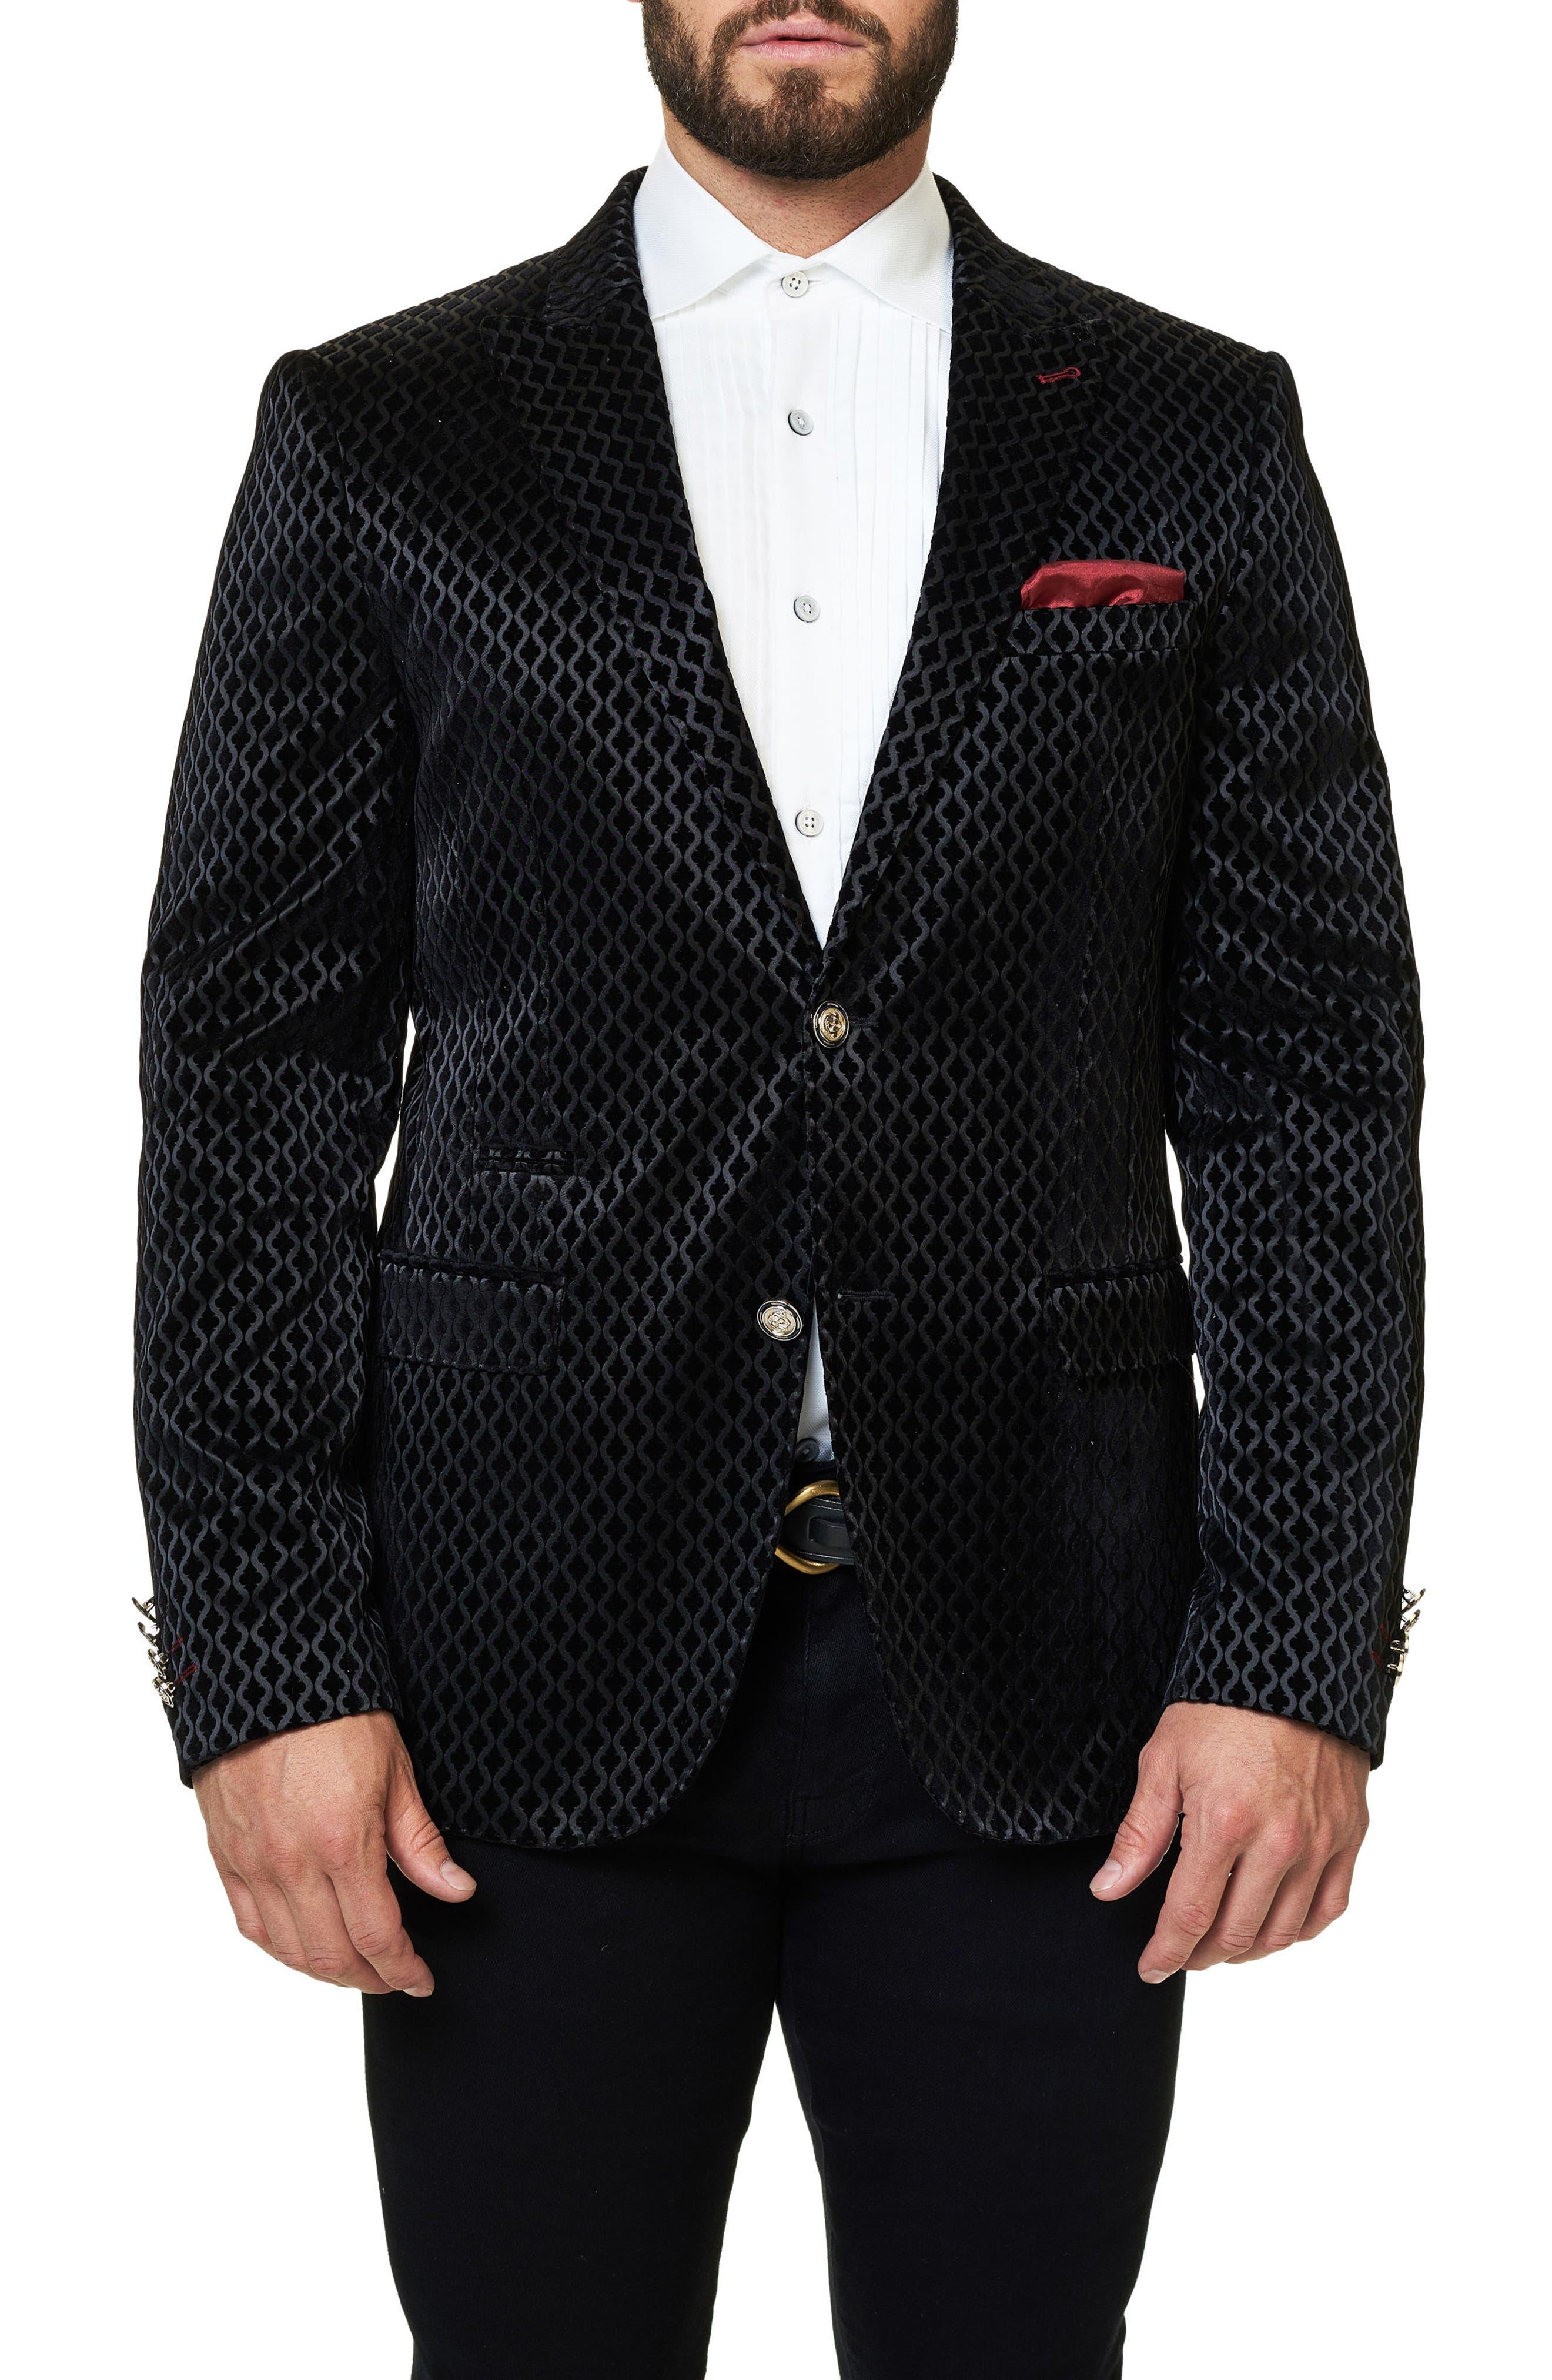 Maceoo Elegance Jacquard Sport Coat